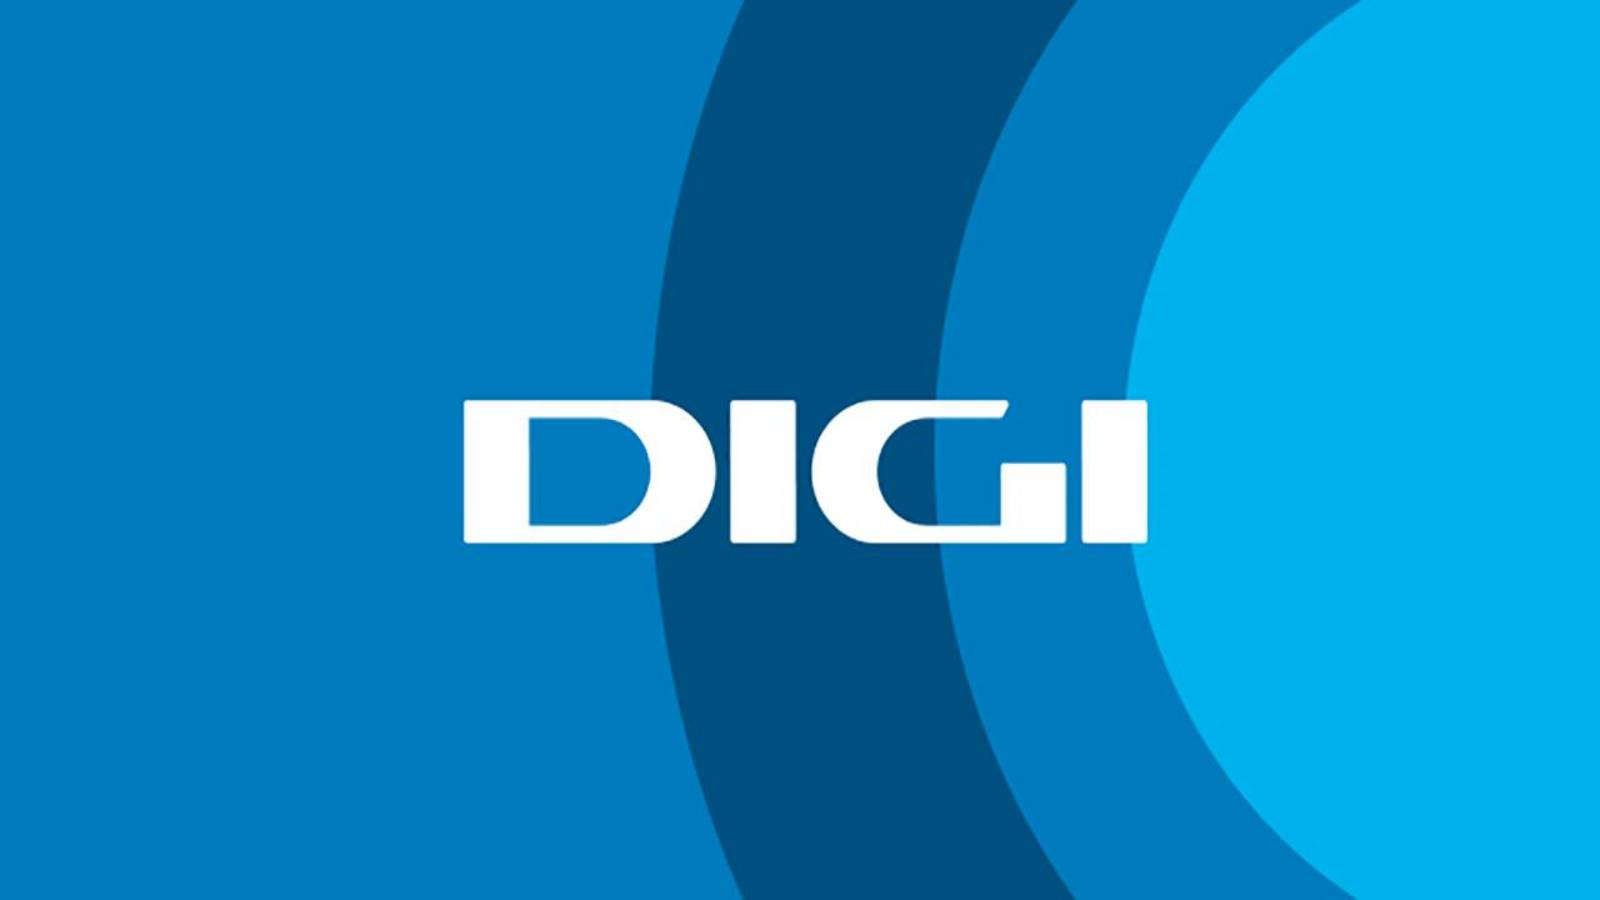 DIGI Romania fiber